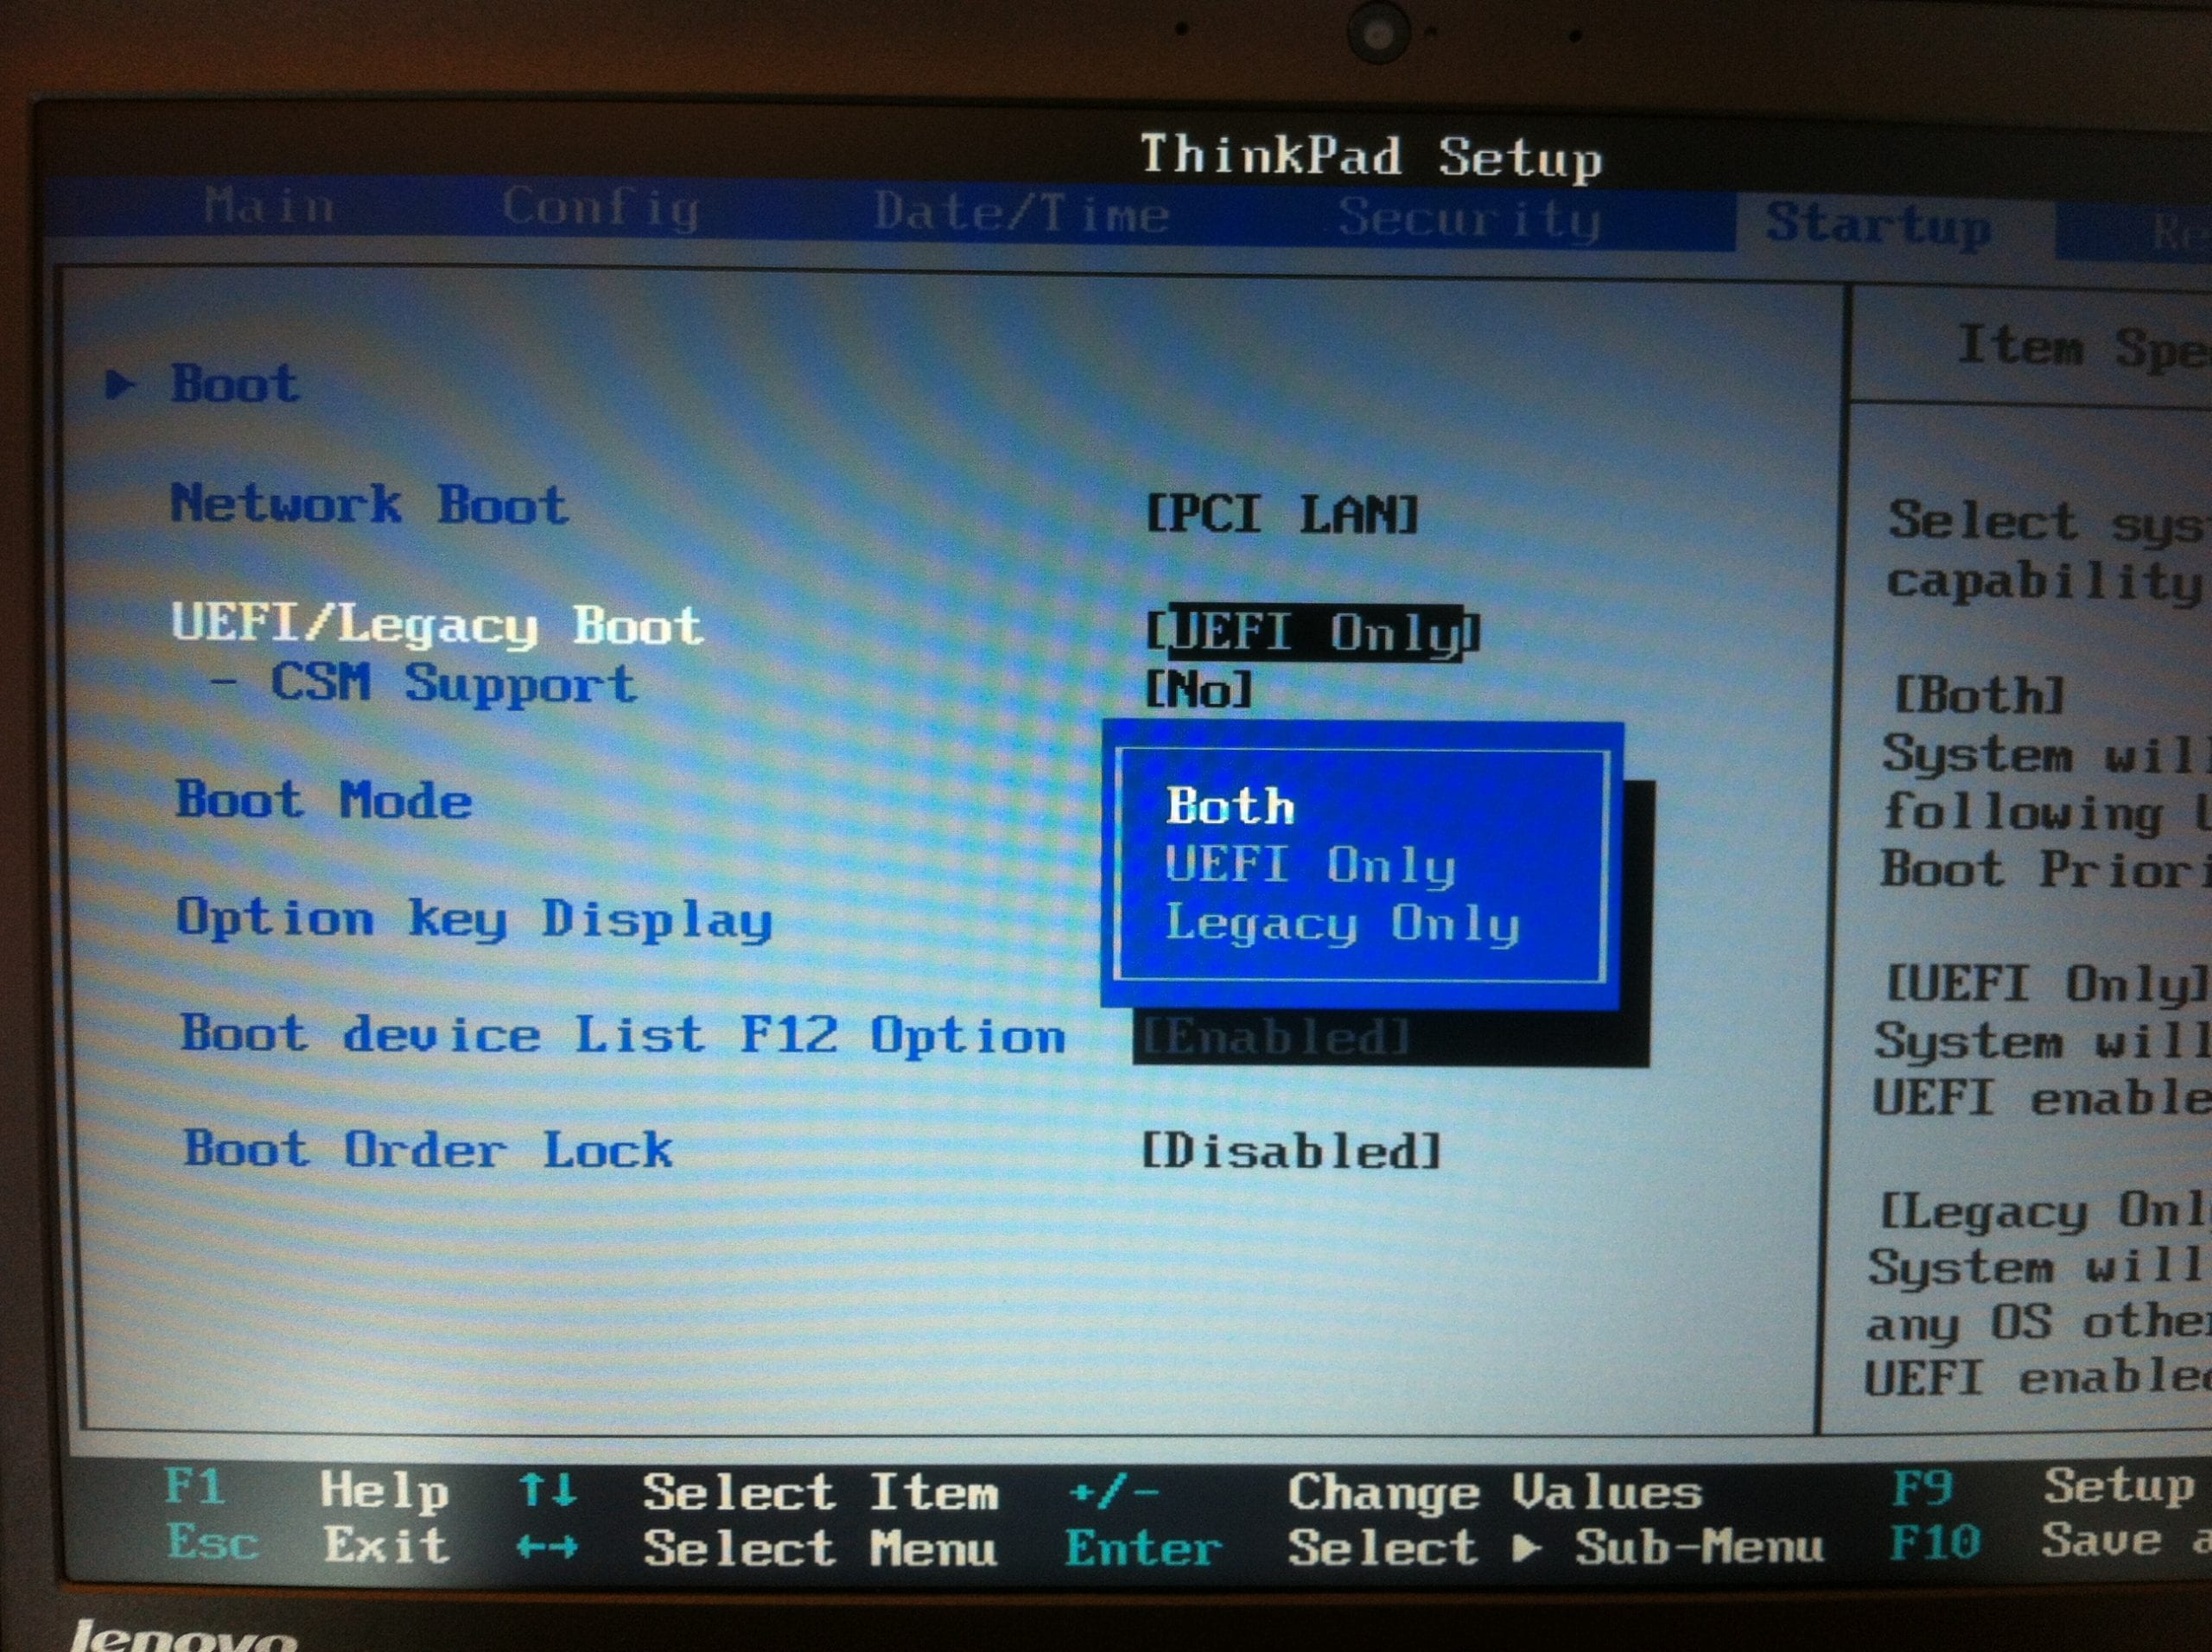 Uefi Legacy Boot Option To Both Next Of Windows